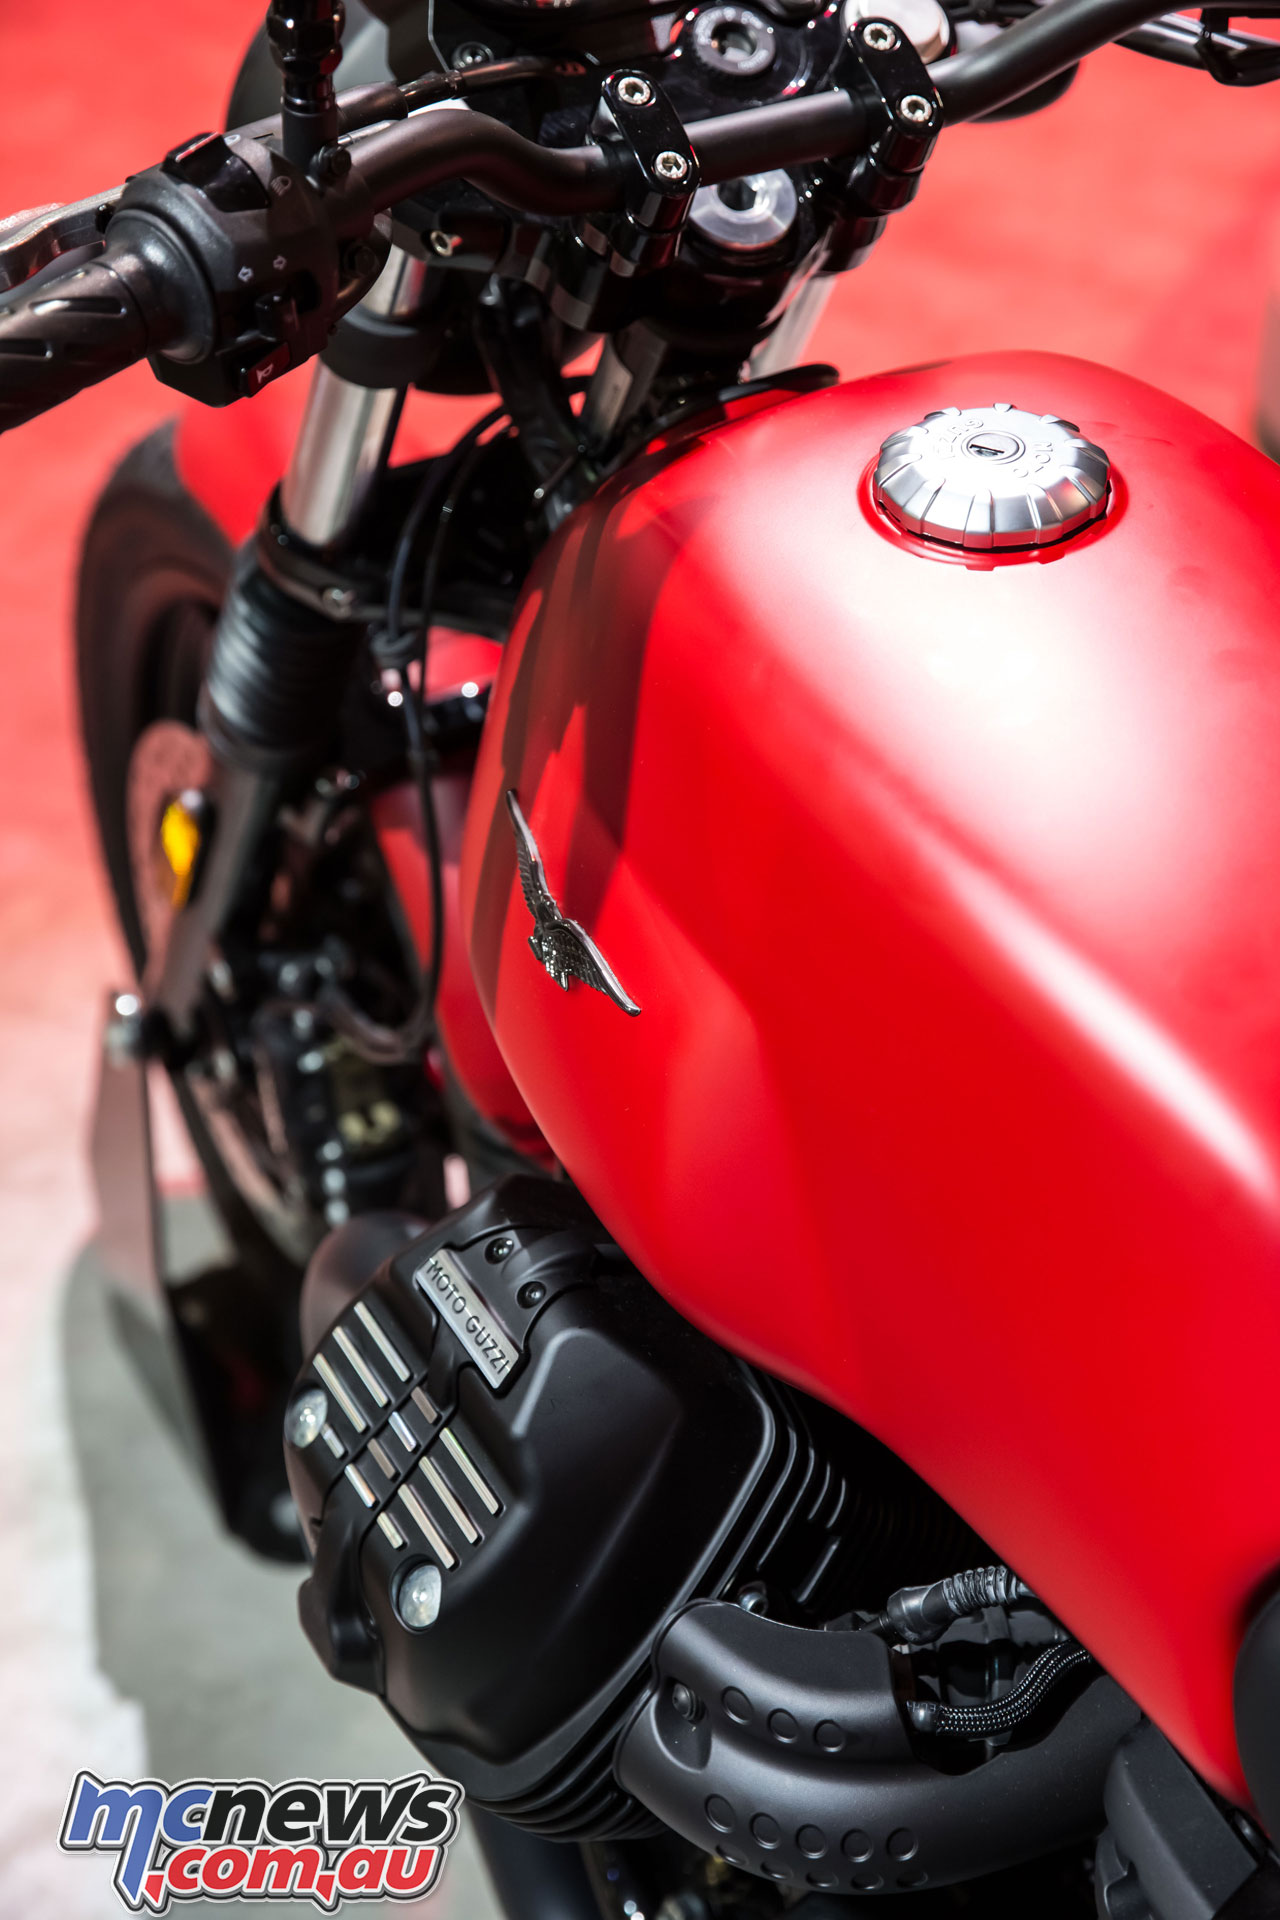 2019 Moto Guzzi V7 III Stone & Stone 'Night Pack' | MCNews